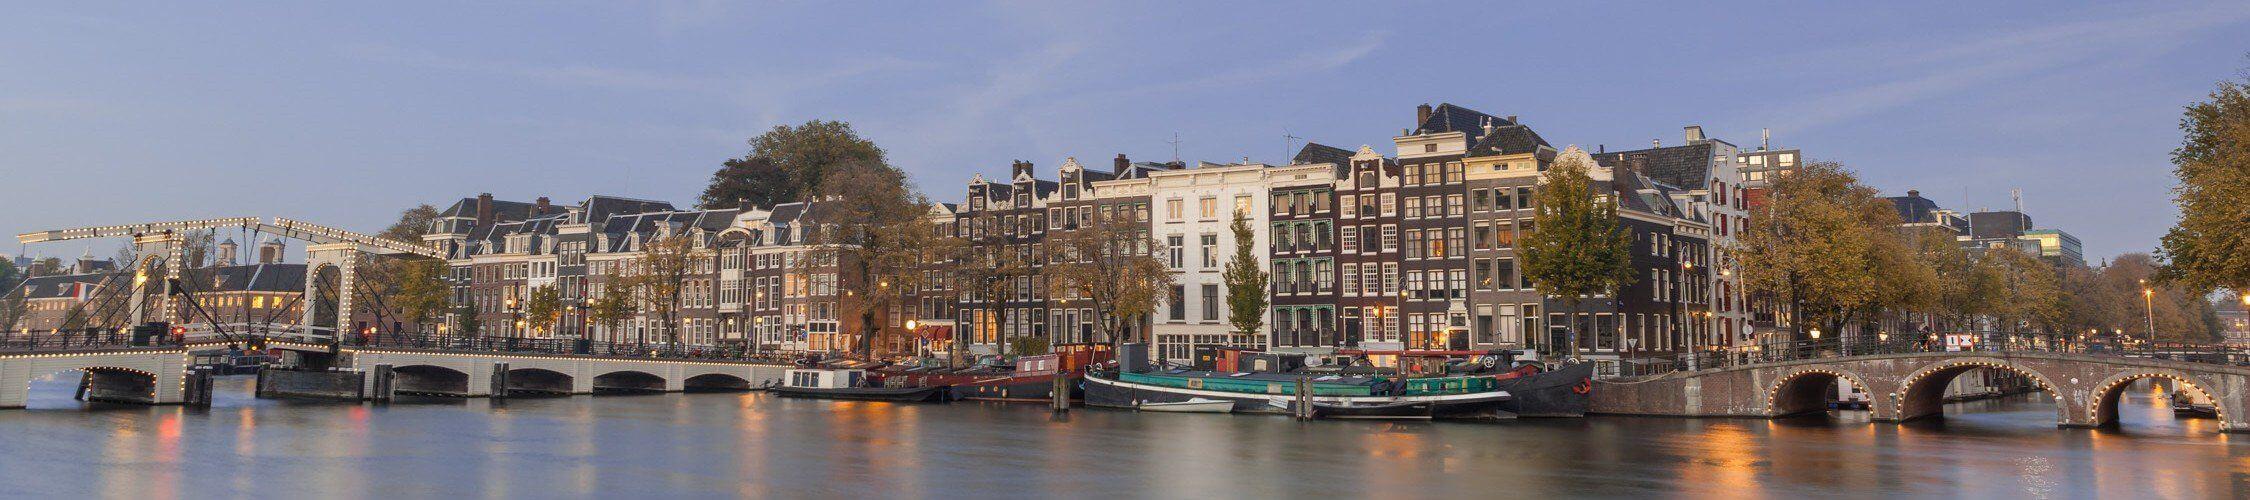 The beautiful Skinny Bridge crossing the Amstel River